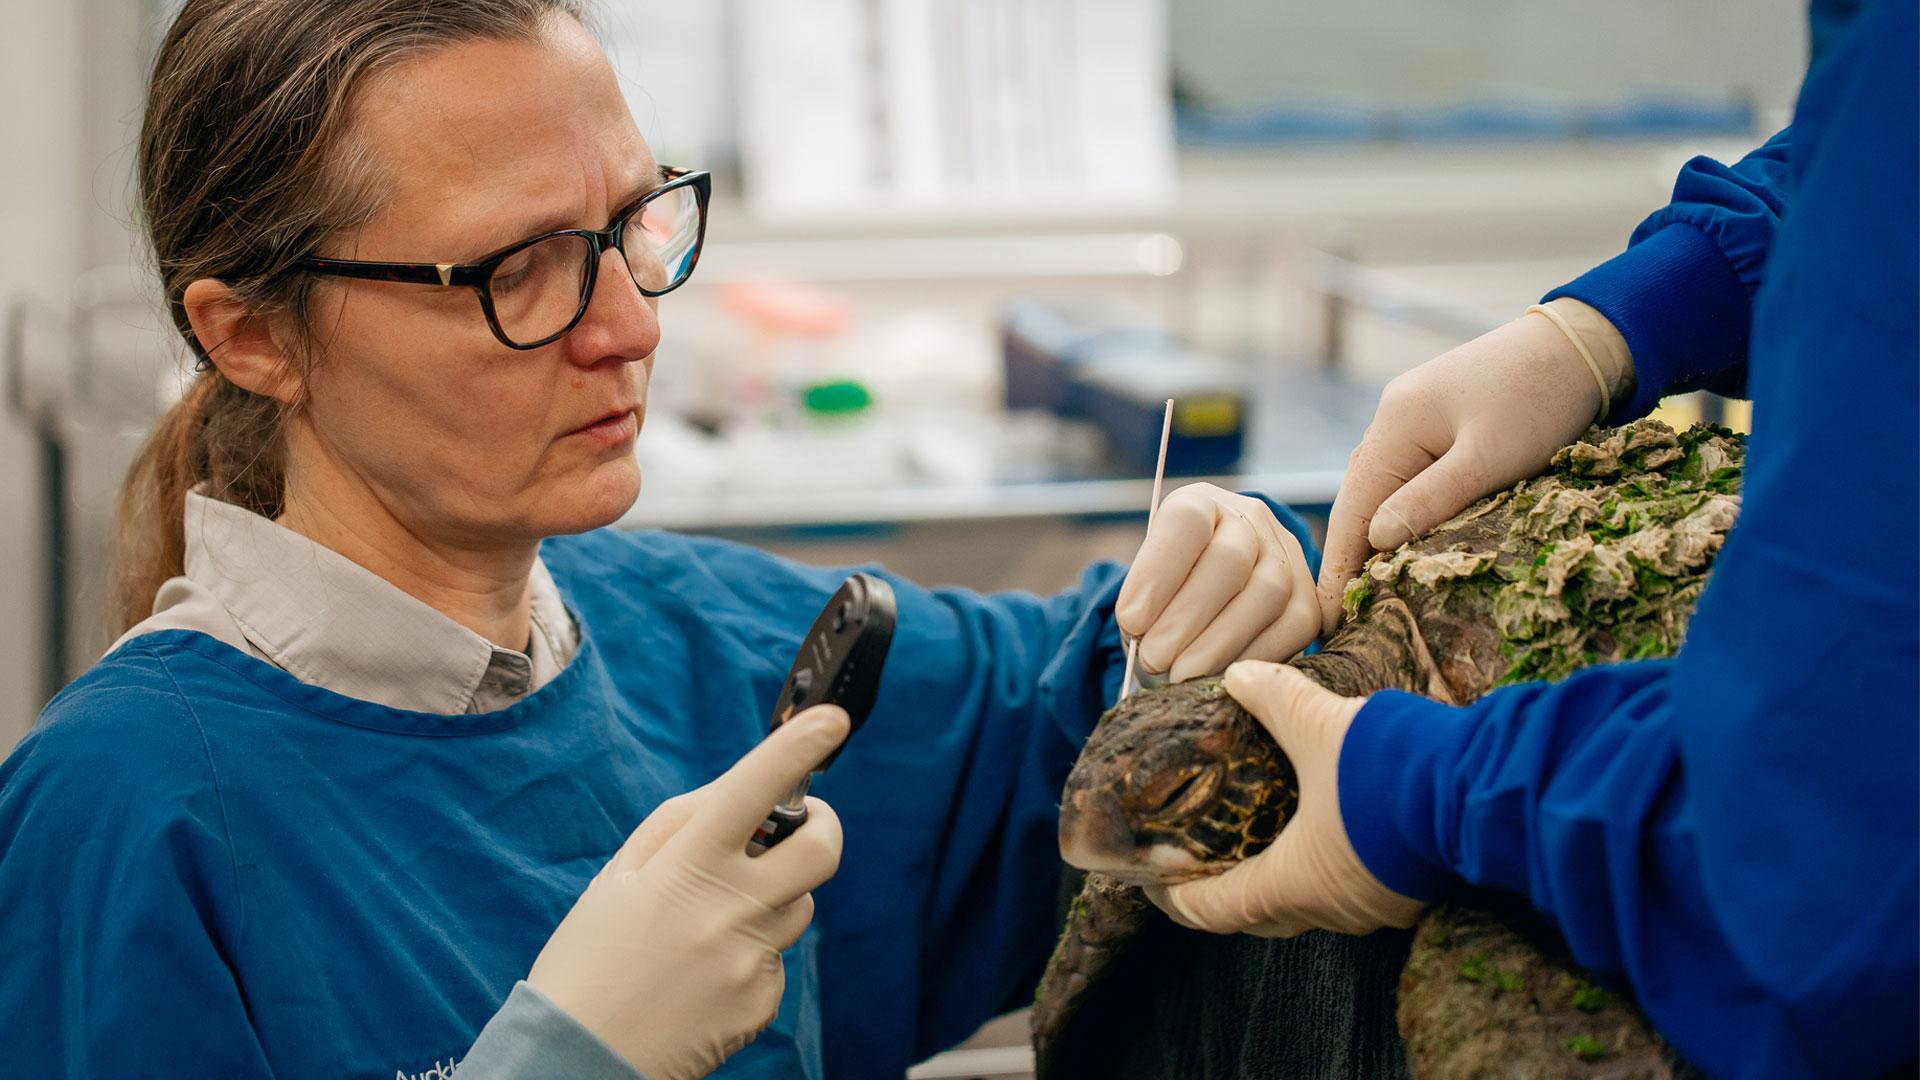 https://rfacdn.nz/zoo/assets/media/green-sea-turtle-an-gallery-1.jpg